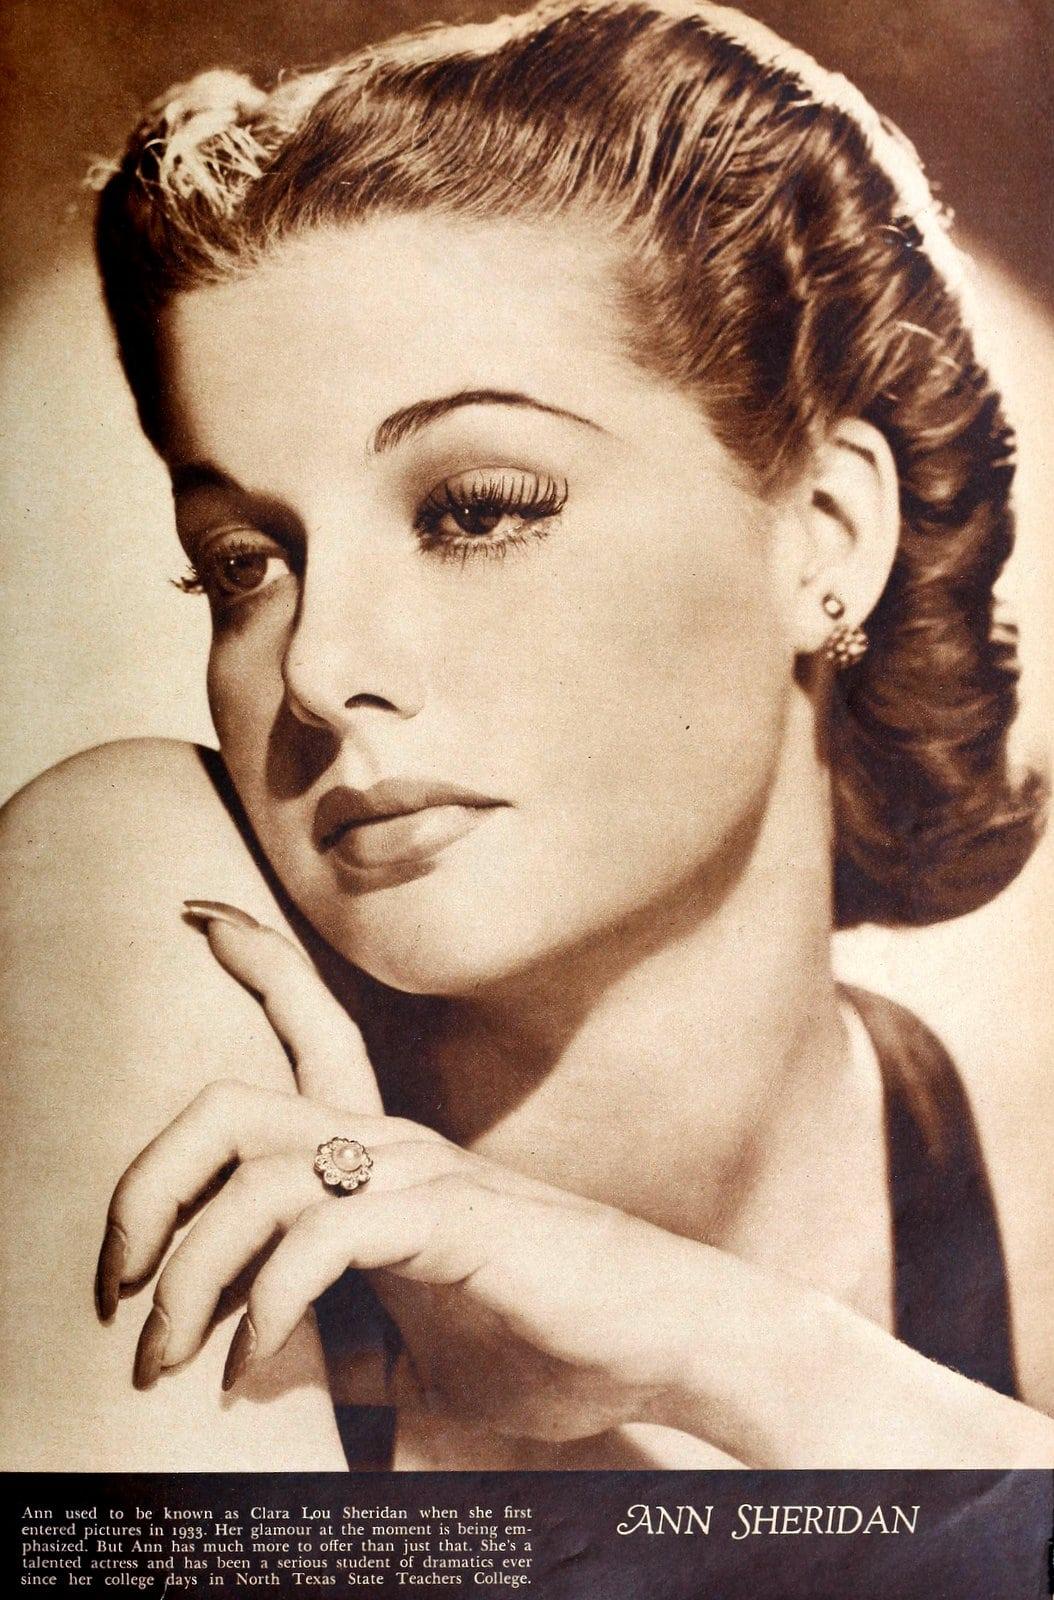 1930s actress Ann Sheridan